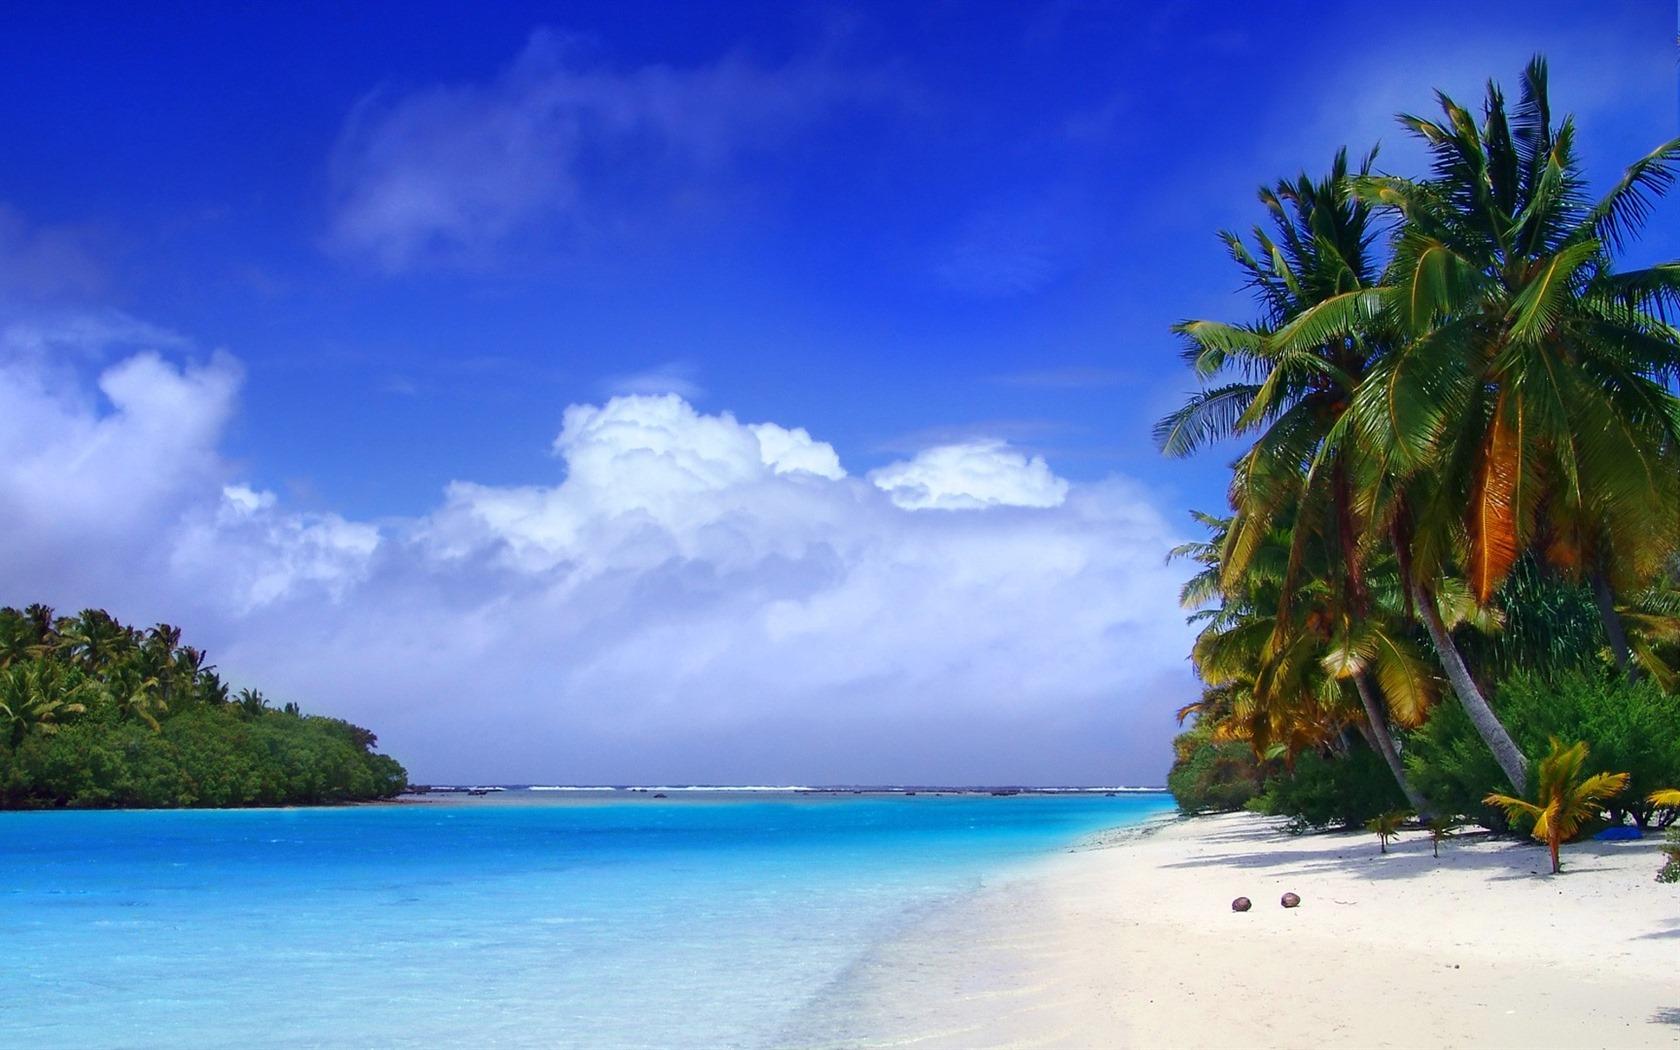 28+ HD Tropical Wallpaper 1680x1050 on WallpaperSafari